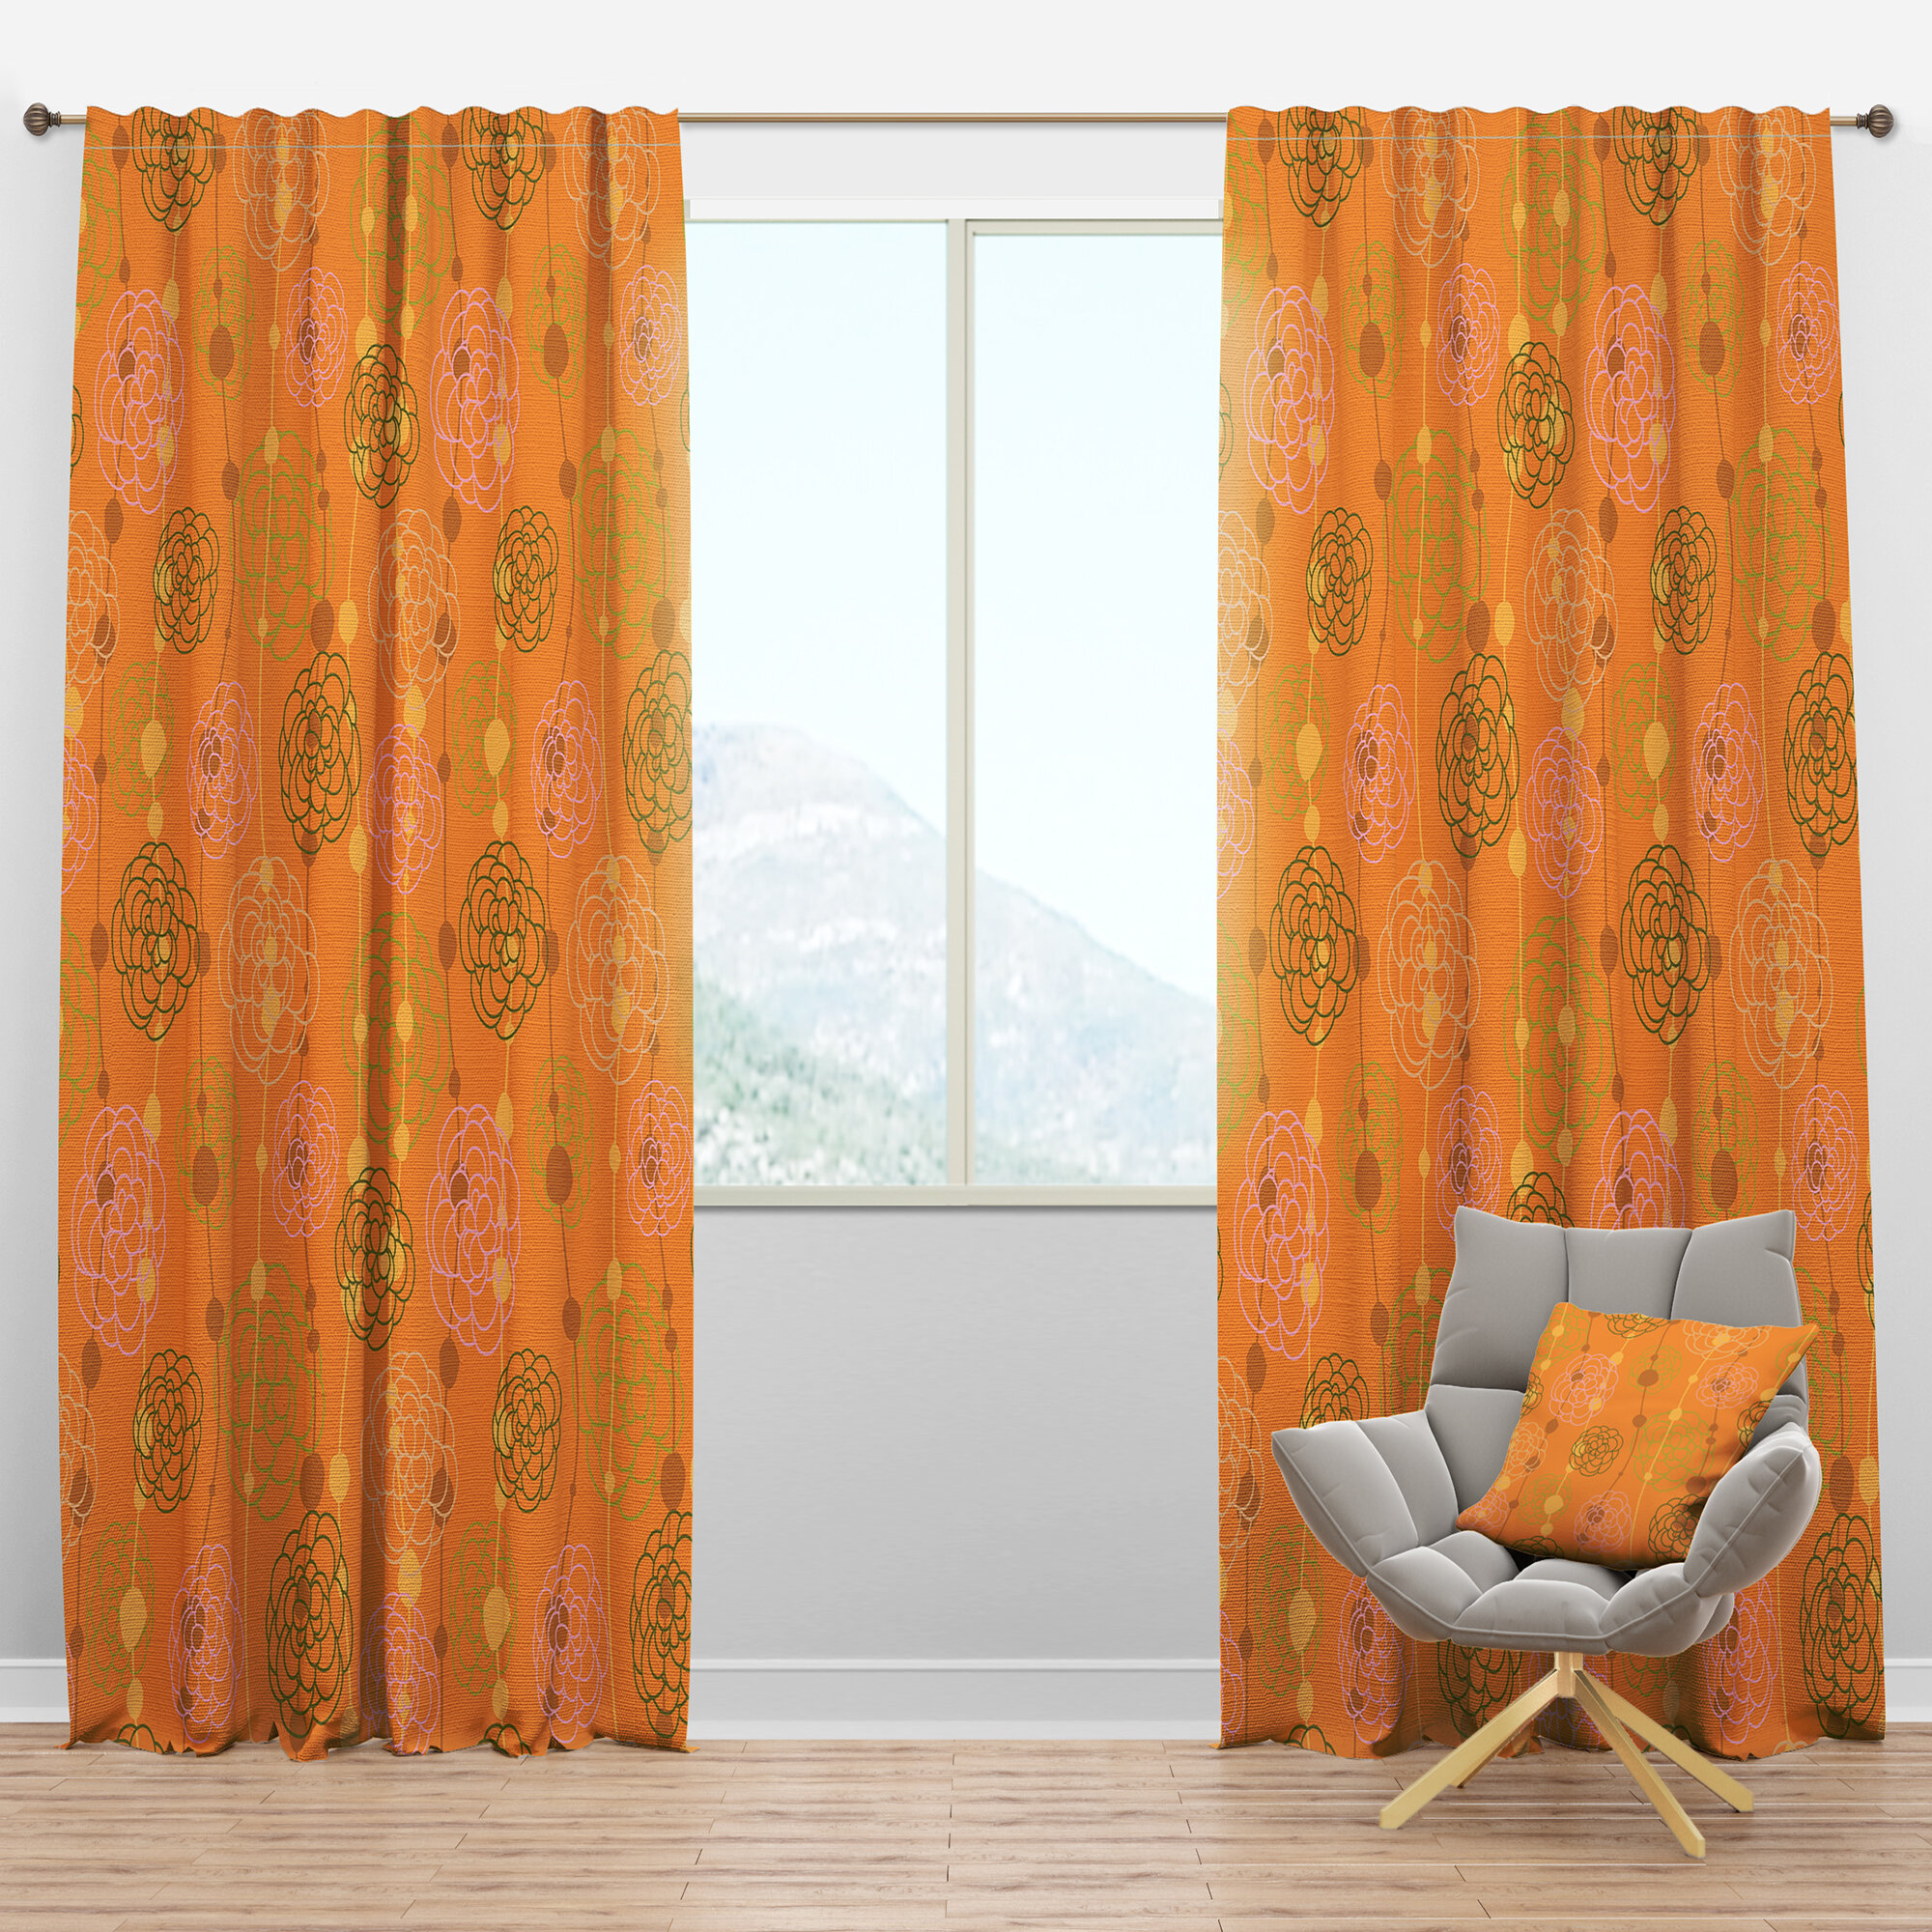 Designart Mid Century Handdrawn Flowers Iii Geometric Semi Sheer Thermal Rod Pocket Single Curtain Panel Wayfair